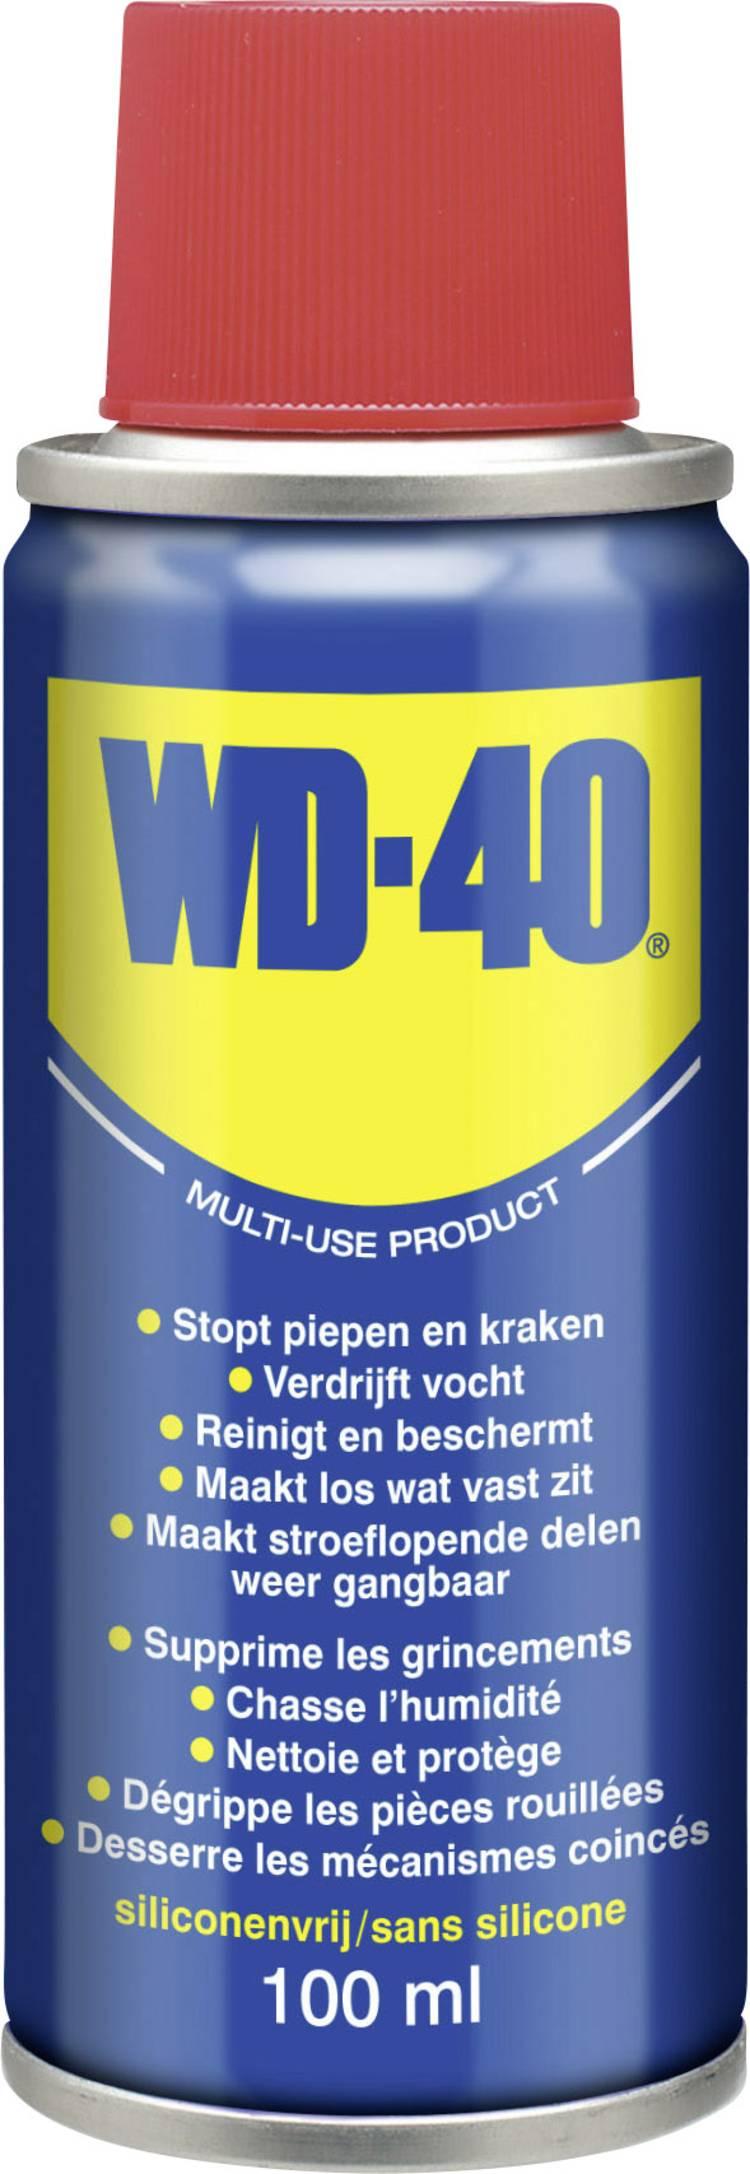 WD-40 Multi-olie 100 ml WD40 Company 0315033